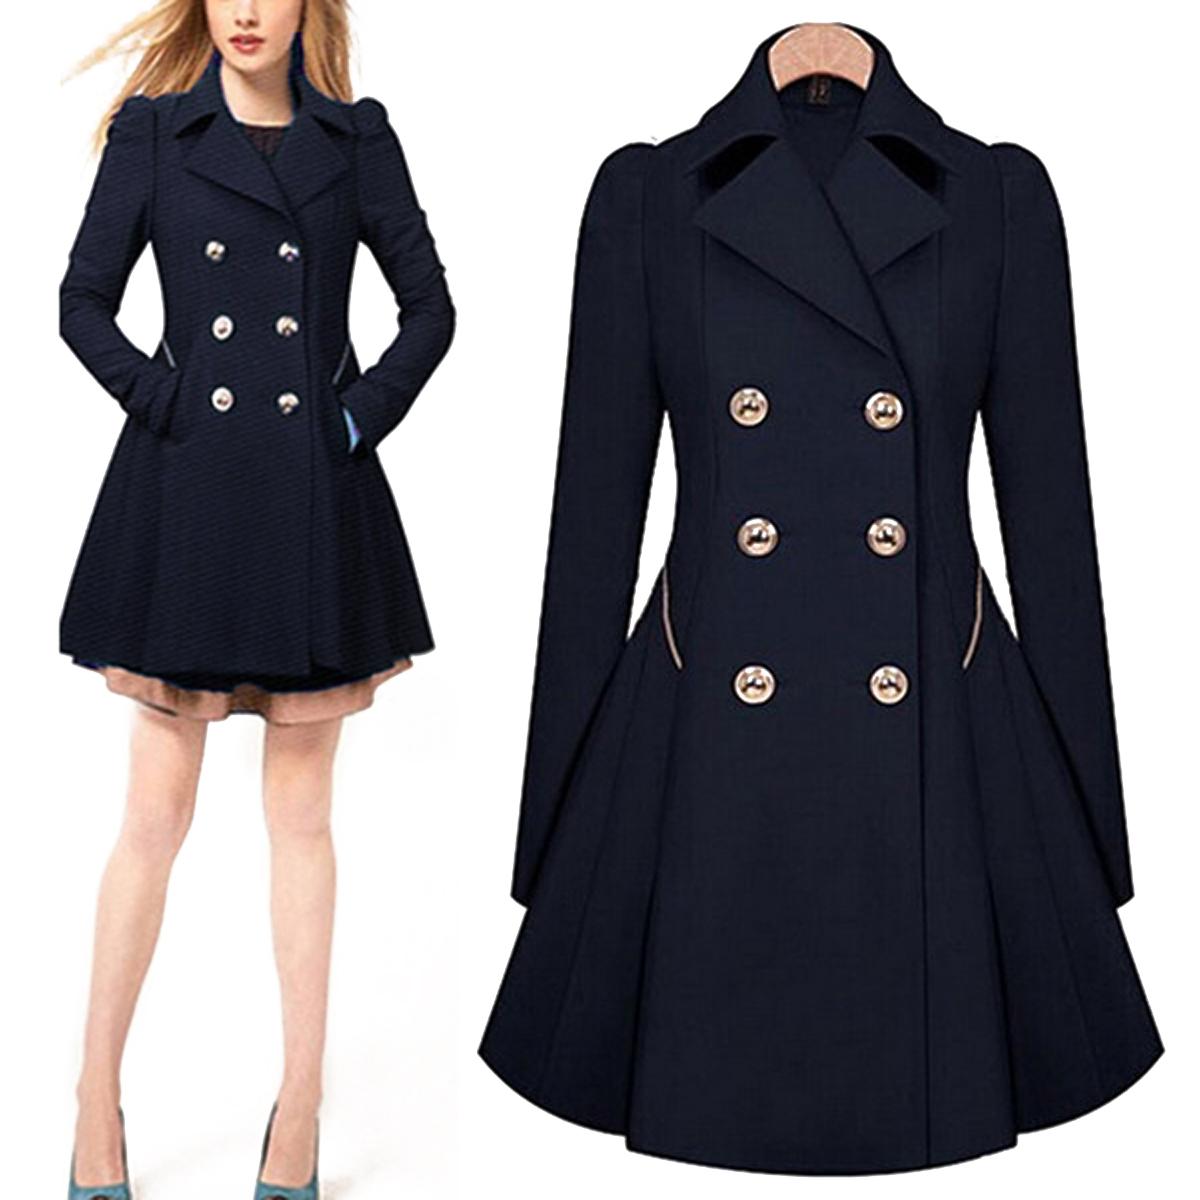 XXL Coats for Women